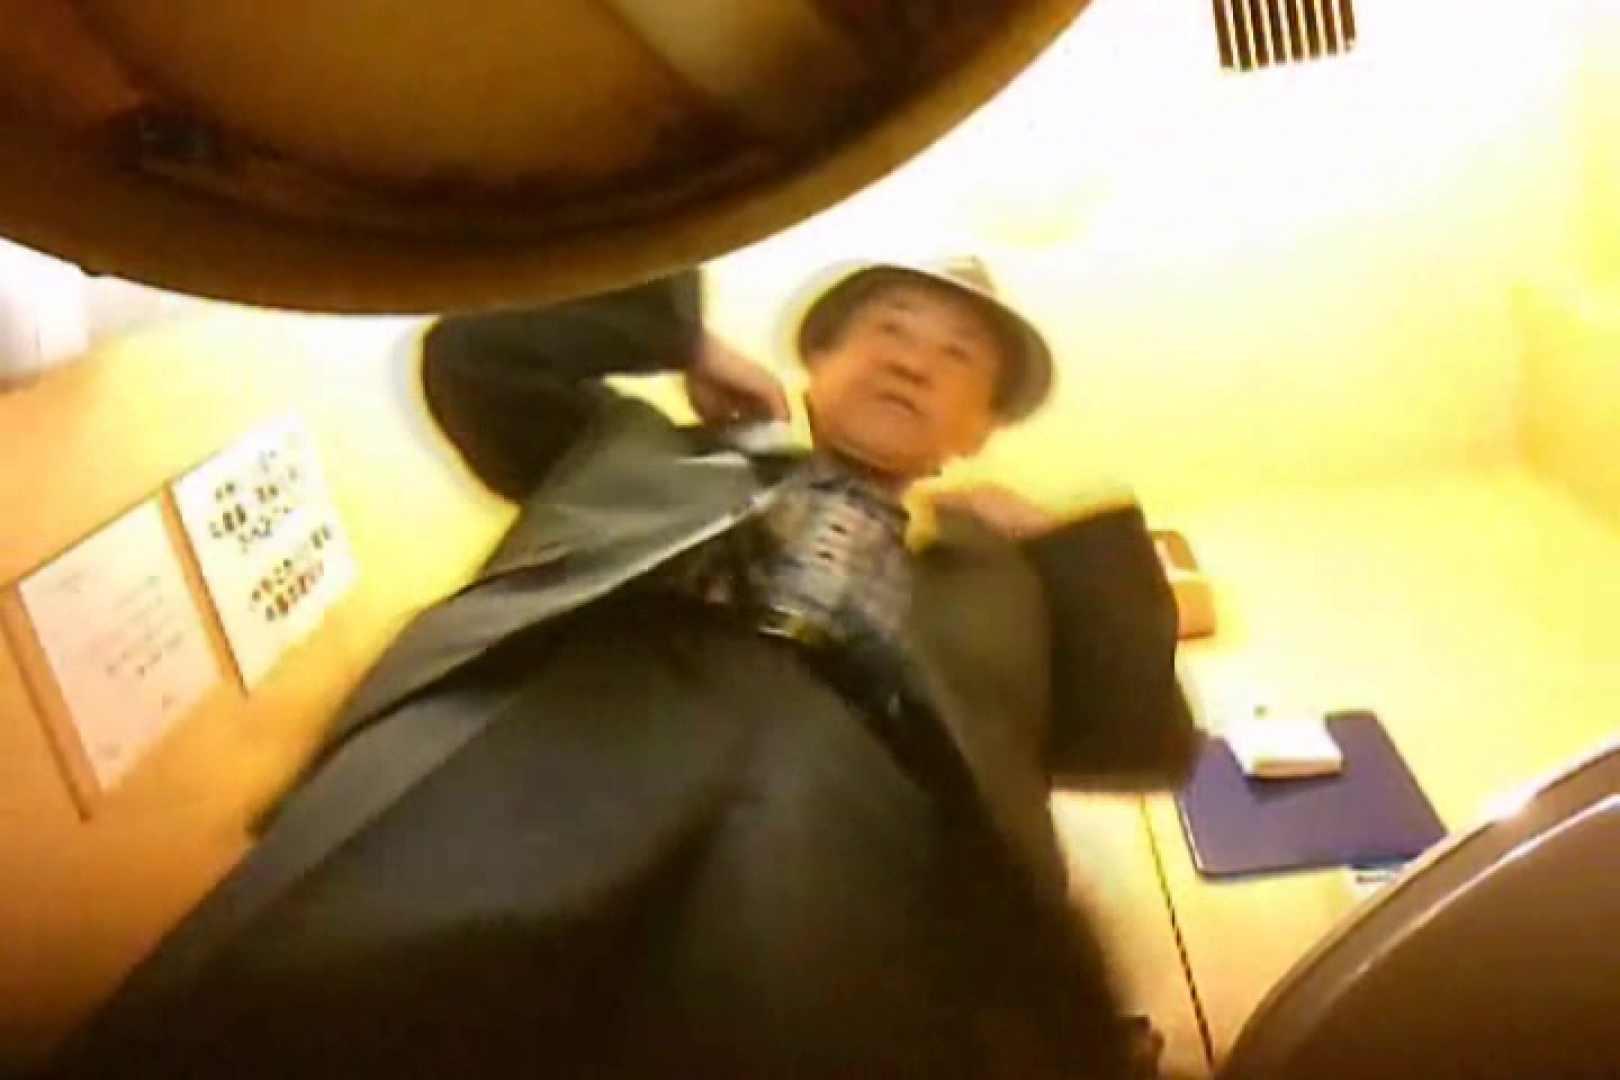 SEASON 3rd!掴み取りさんの洗面所覗き!in新幹線!VOL.09 完全無修正版 ゲイ流出動画キャプチャ 108枚 23